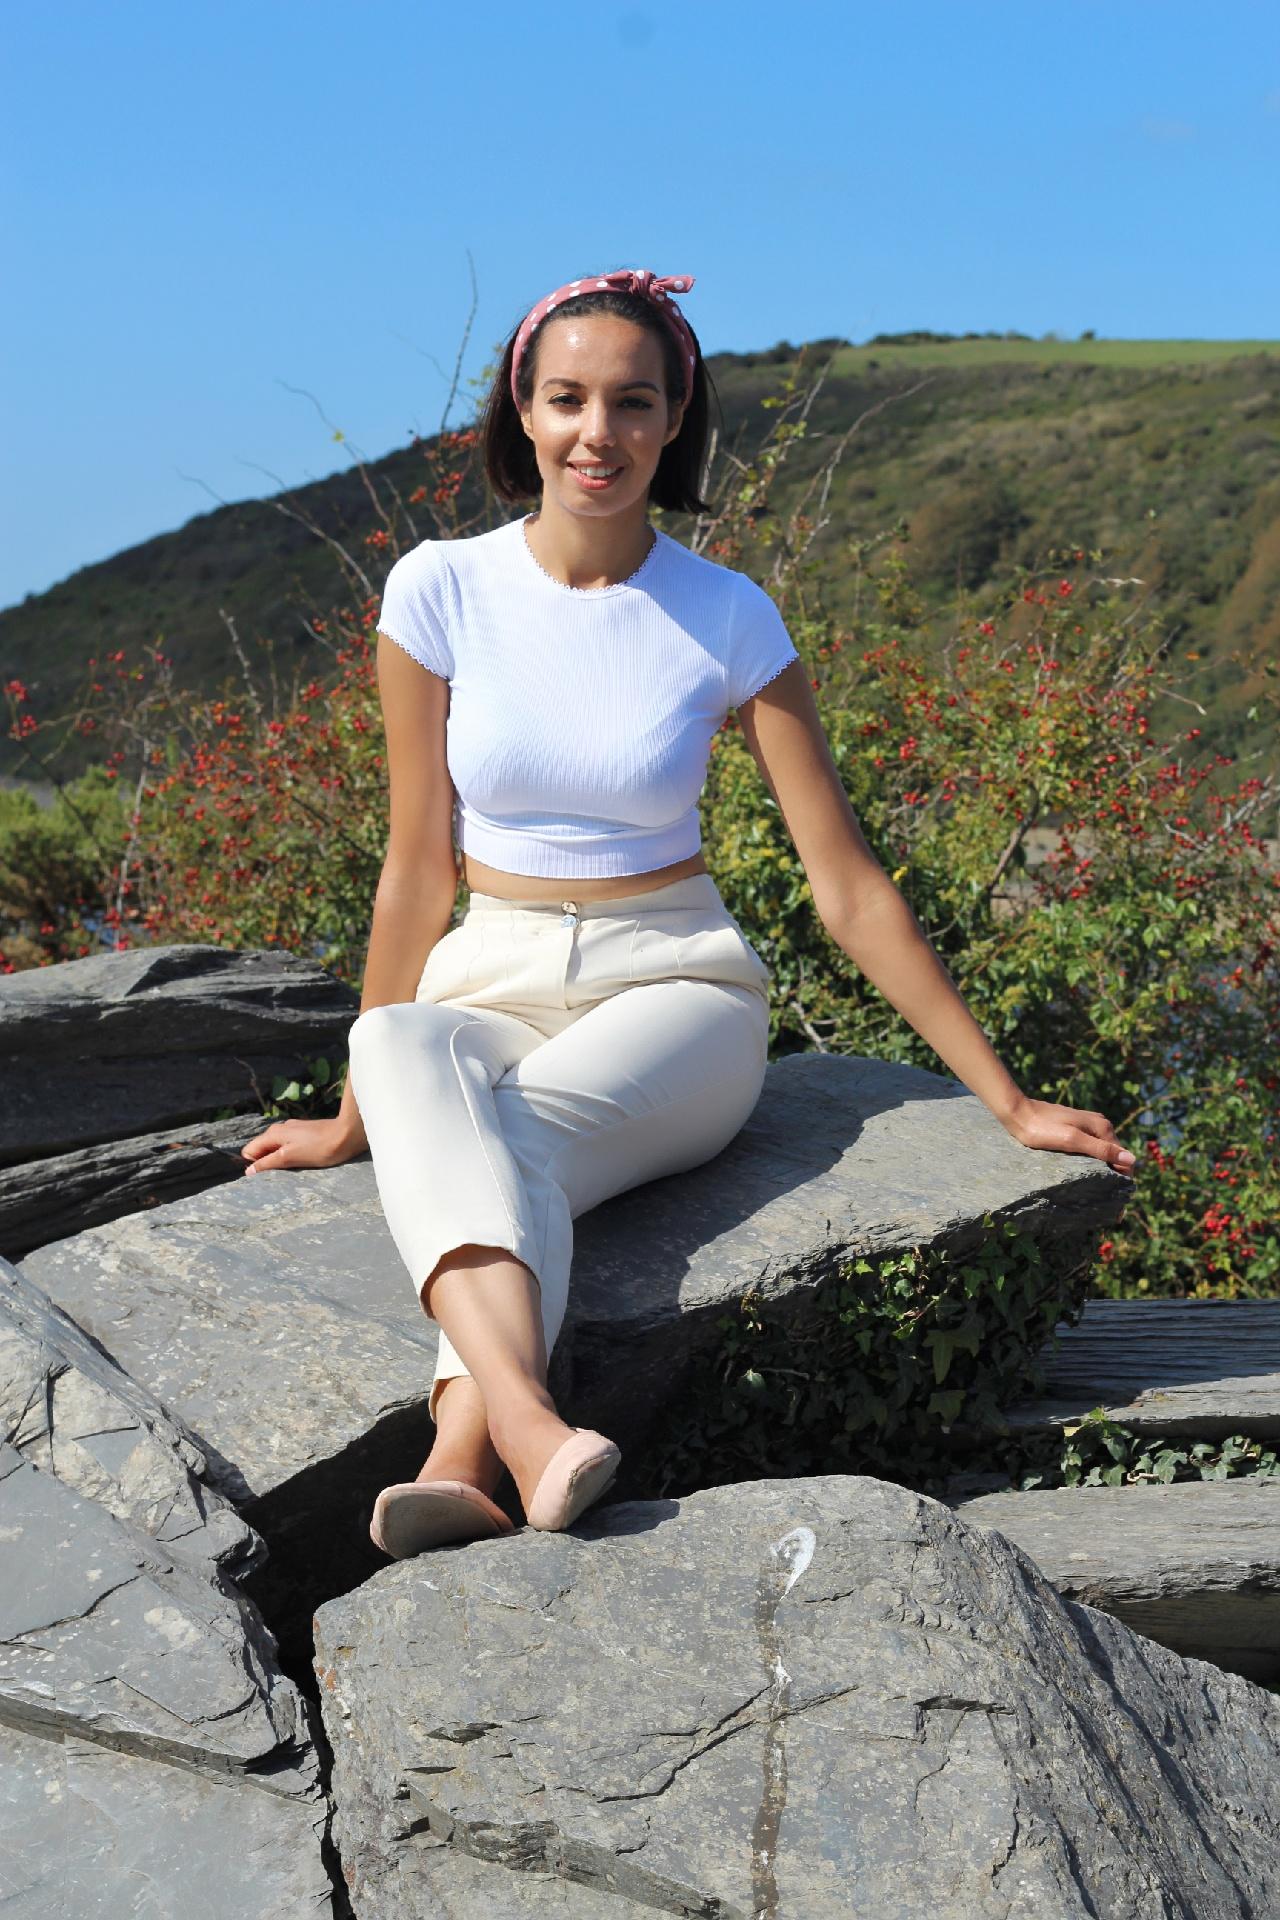 women's lifestyle blog UK - lifestyle blogs - The Style of Laura Jane